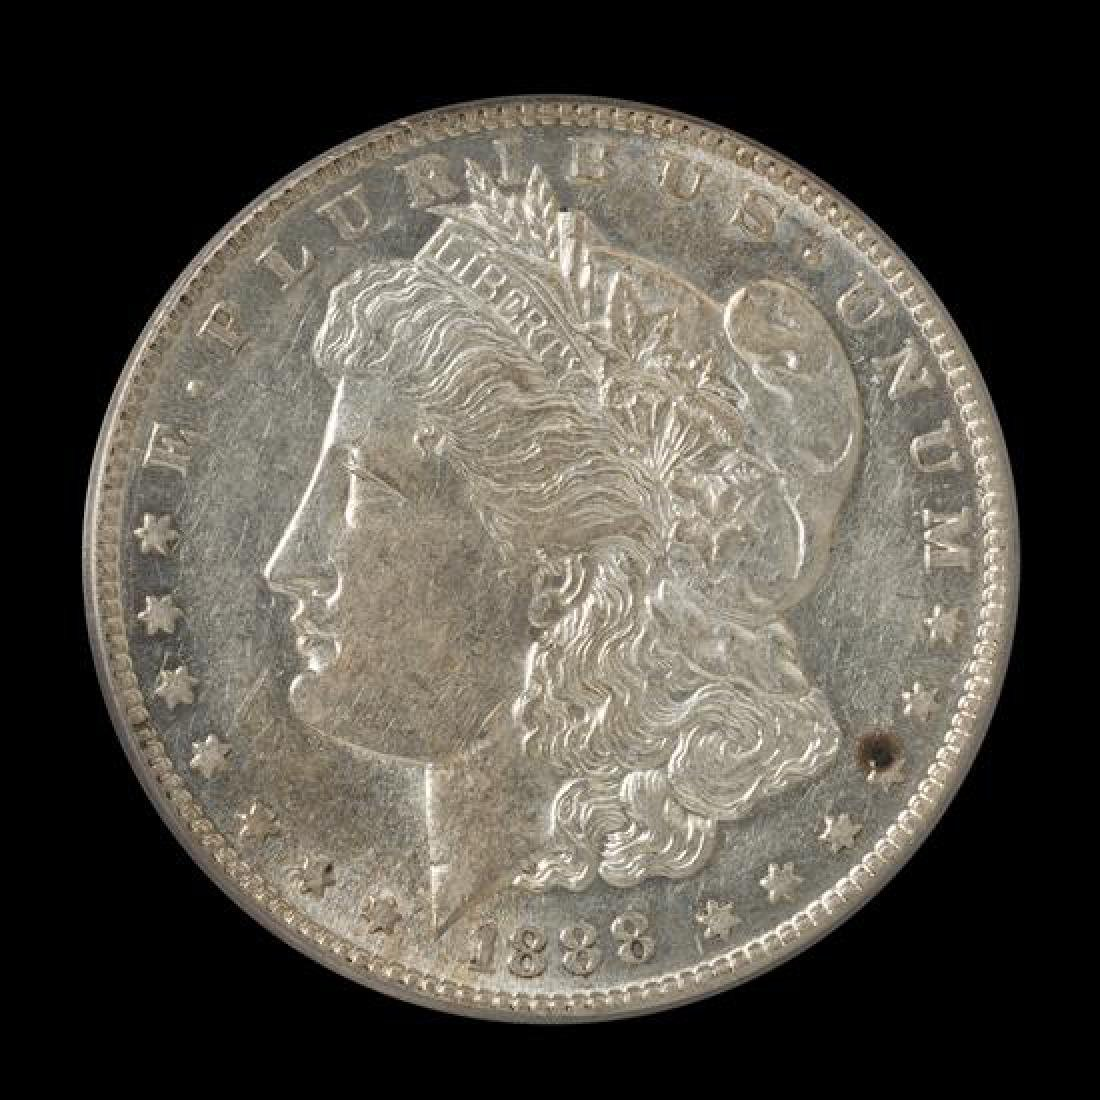 A United States 1888-S Morgan Silver Dollar Coin